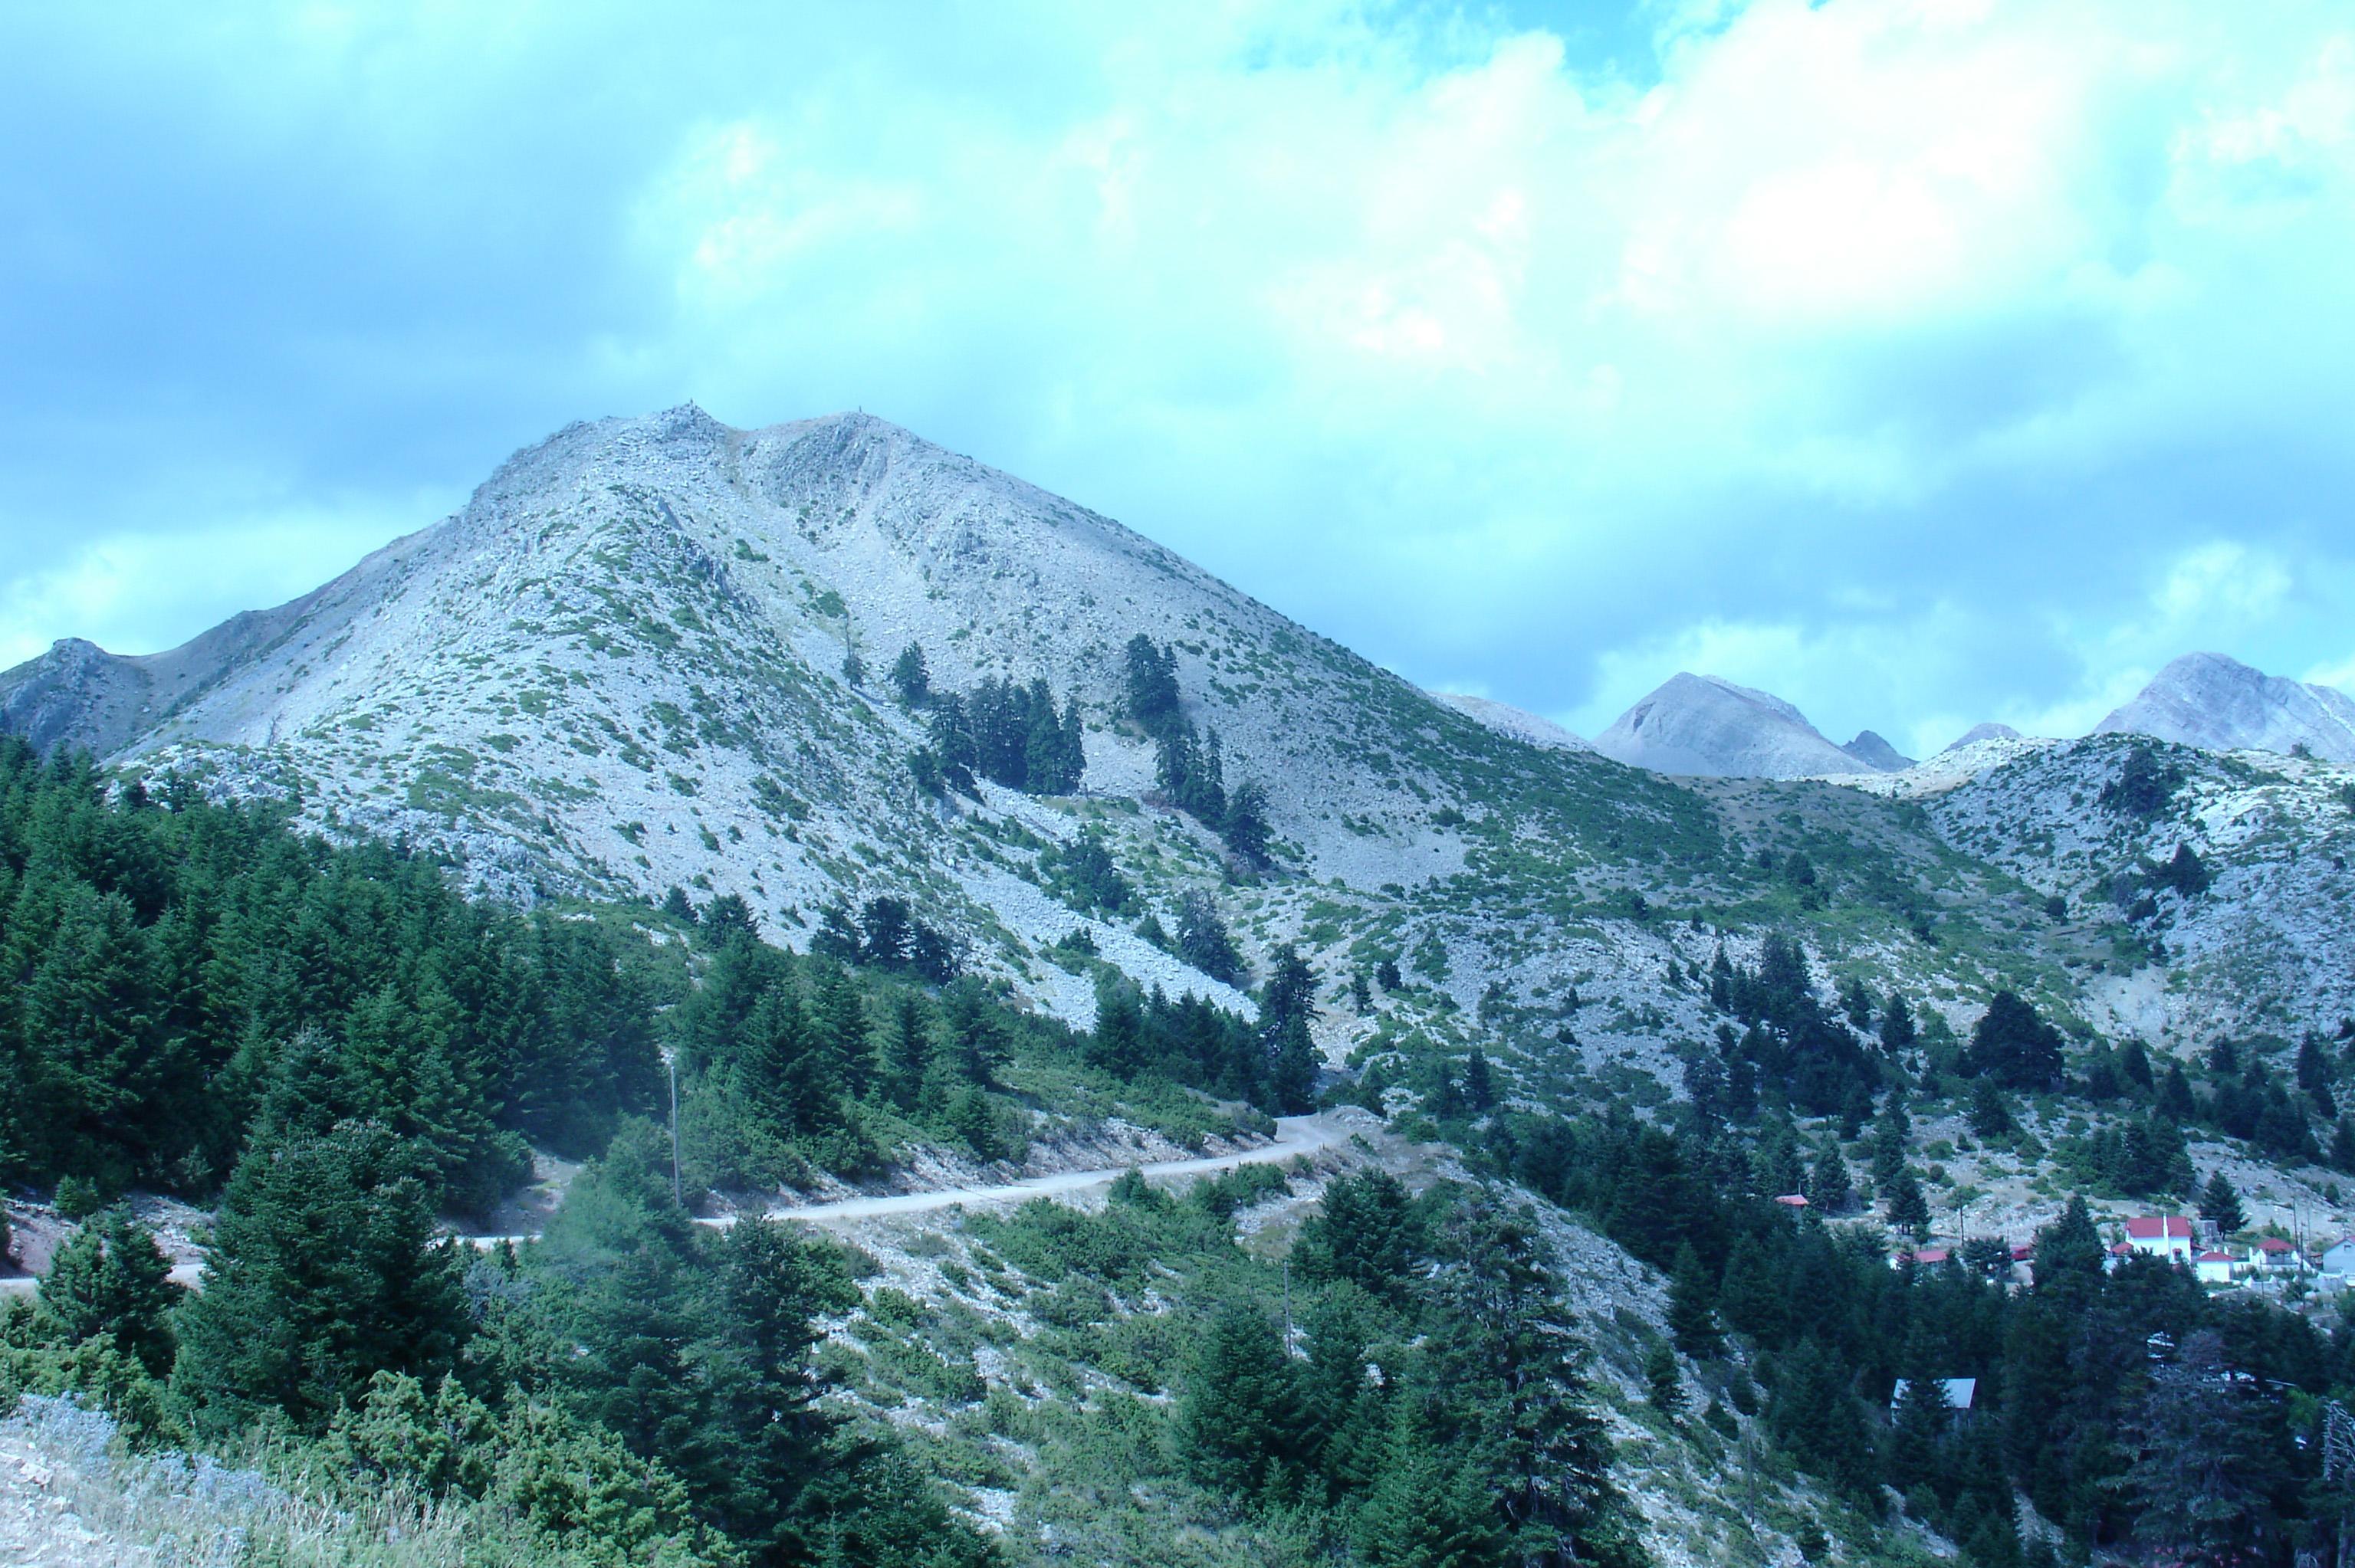 File:Arenta Mountain - Evrytania, Greece - 03.jpg - Wikimedia Commons Mountain